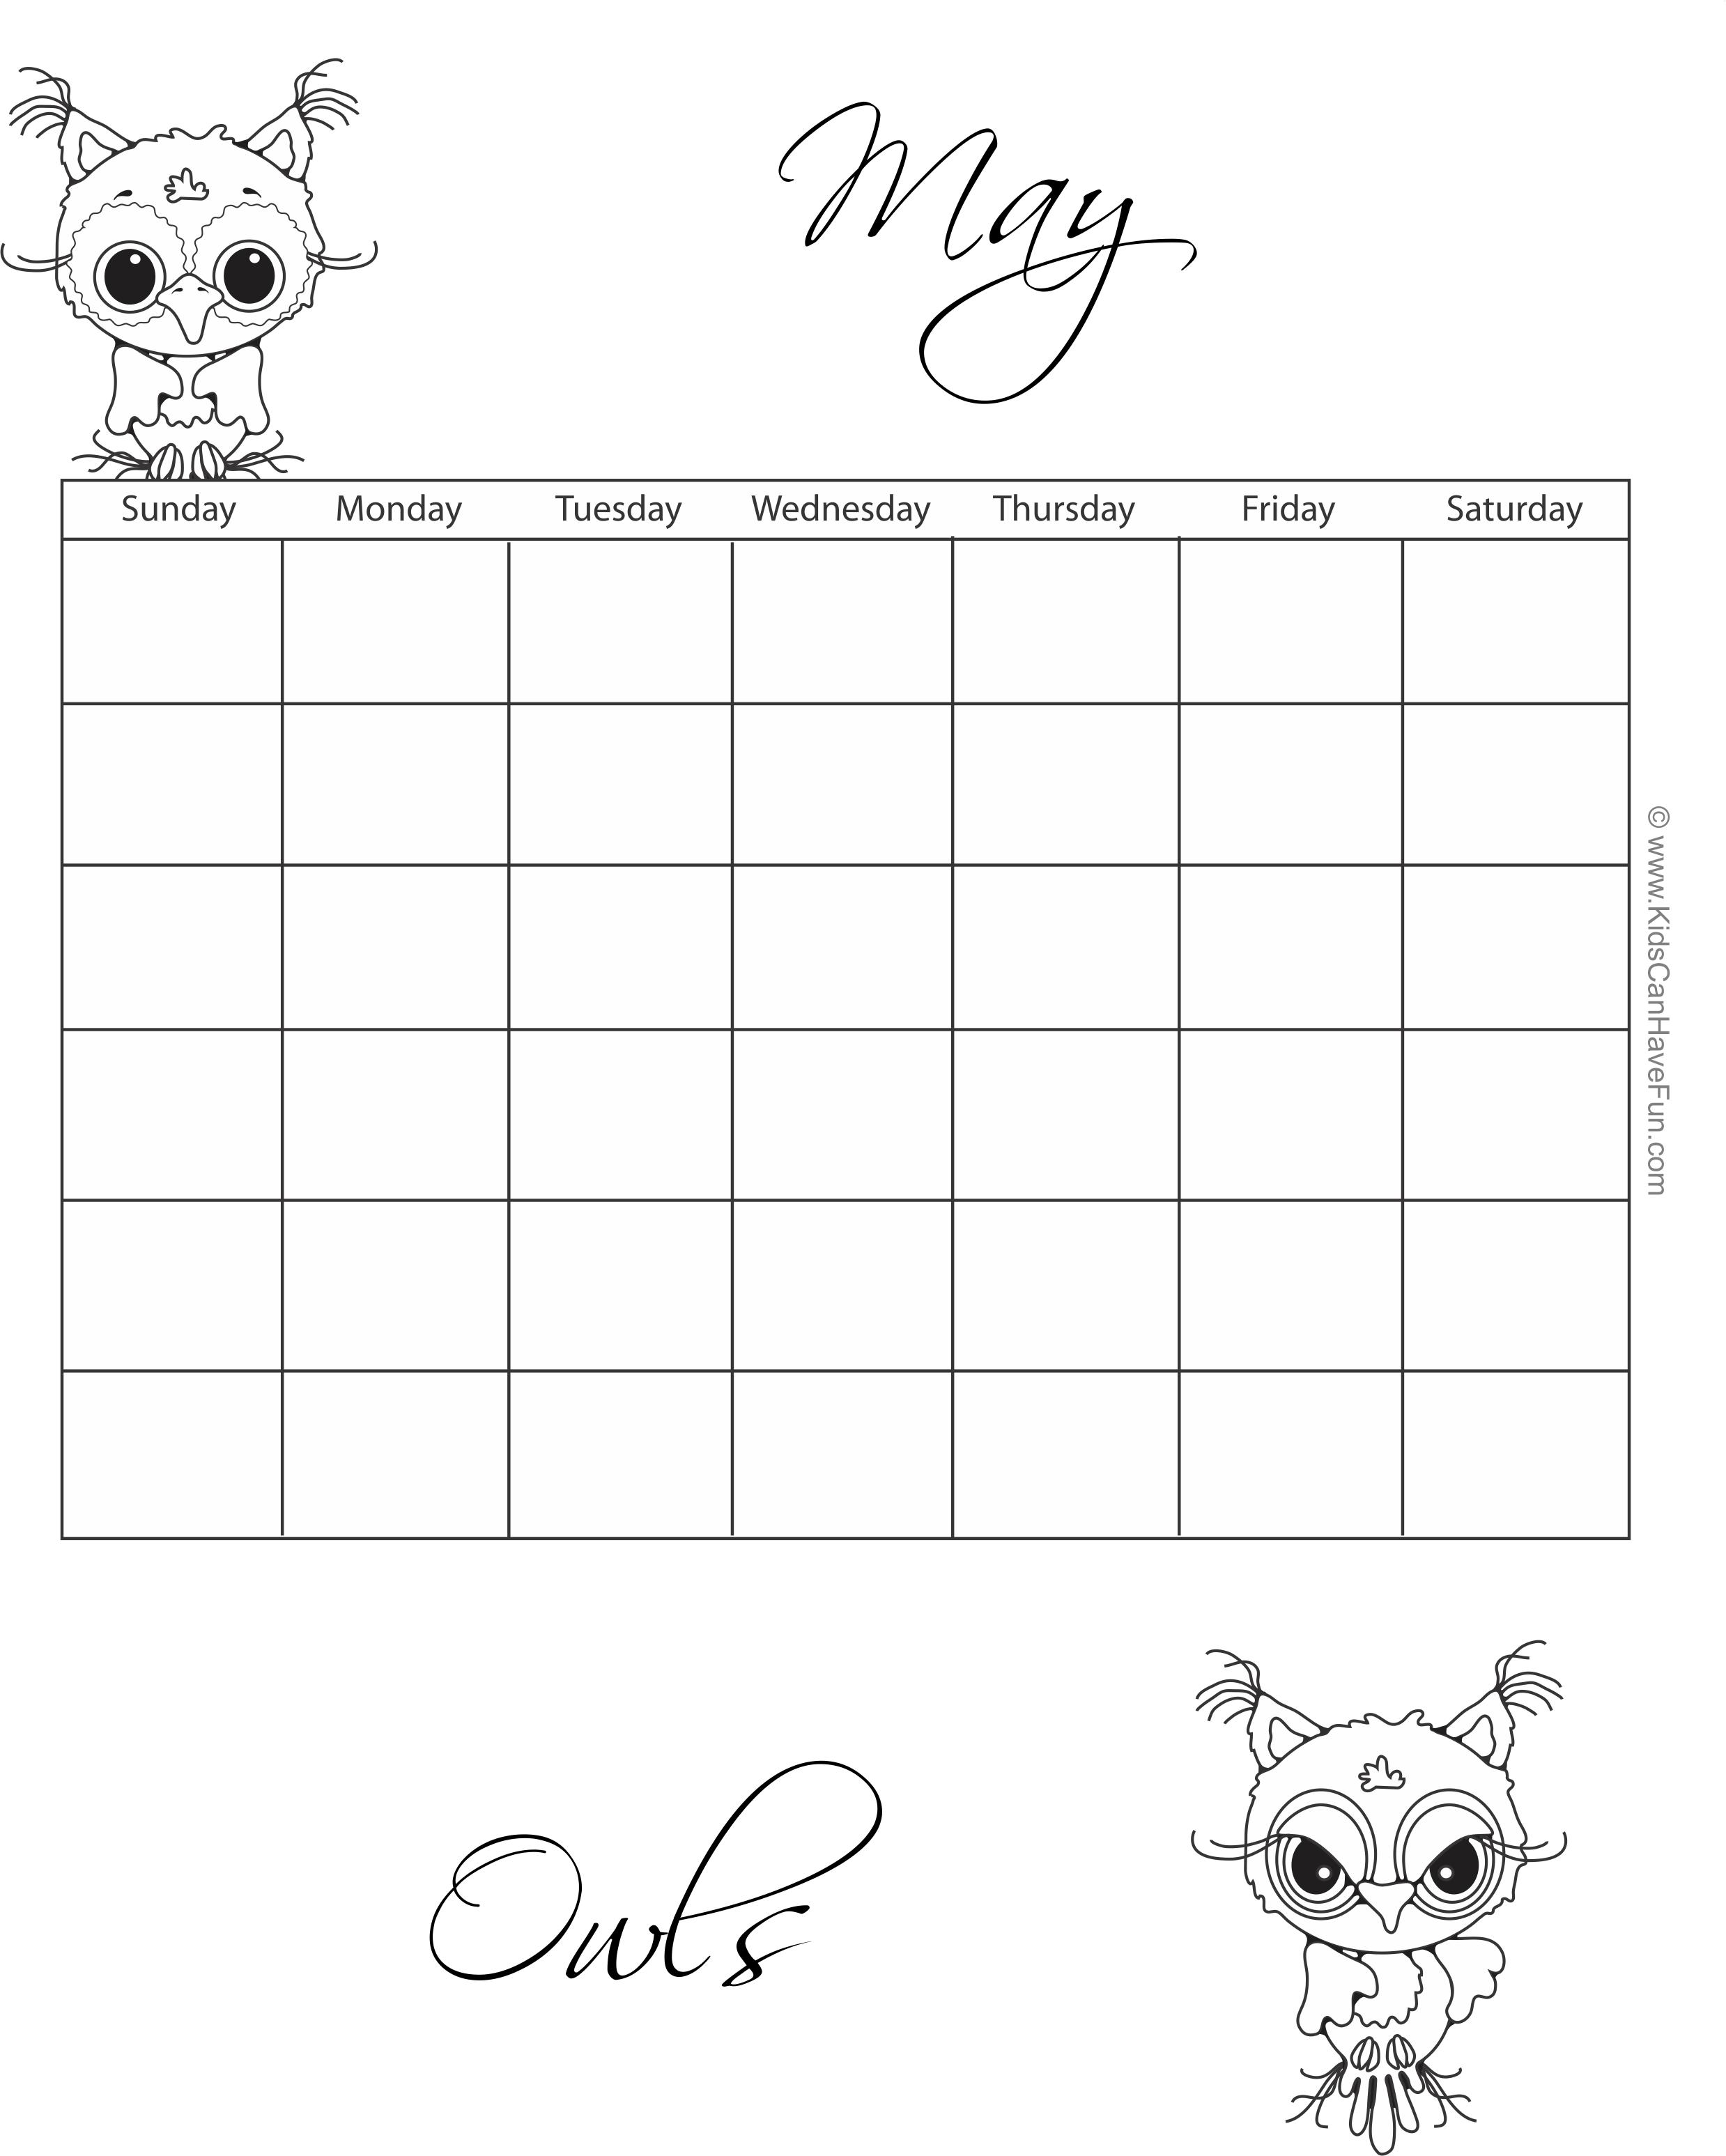 May Owls Coloring Calendar http://www.kidscanhavefun pluspng.com/printable- - Owl Calendar PNG